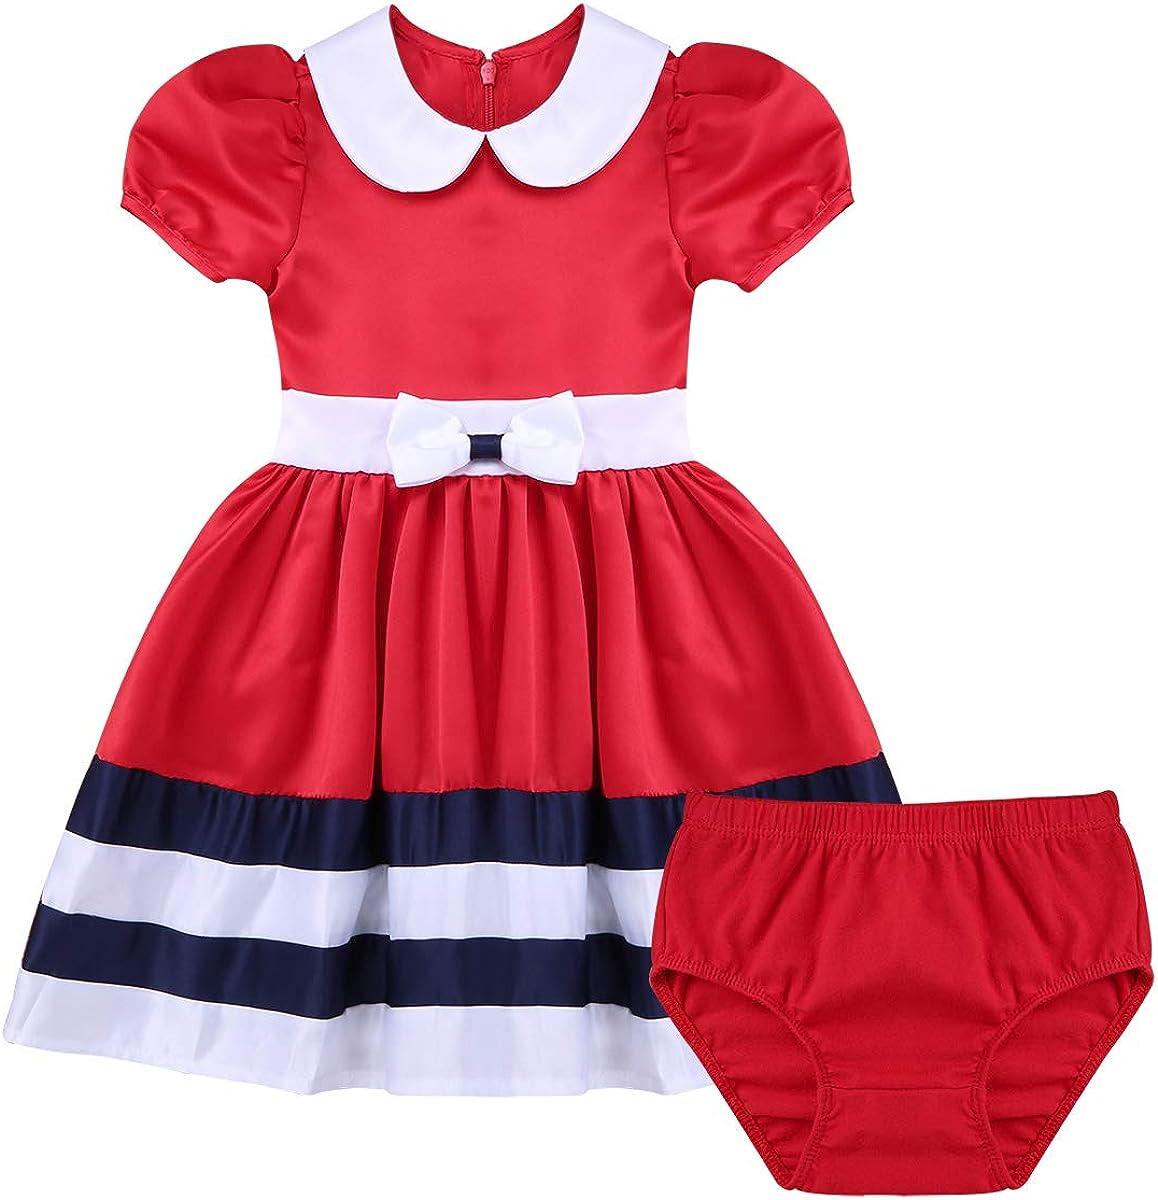 Superlatite Freebily Popular brand in the world Baby Doll Collar Nautical Dress 1st Birthday Party